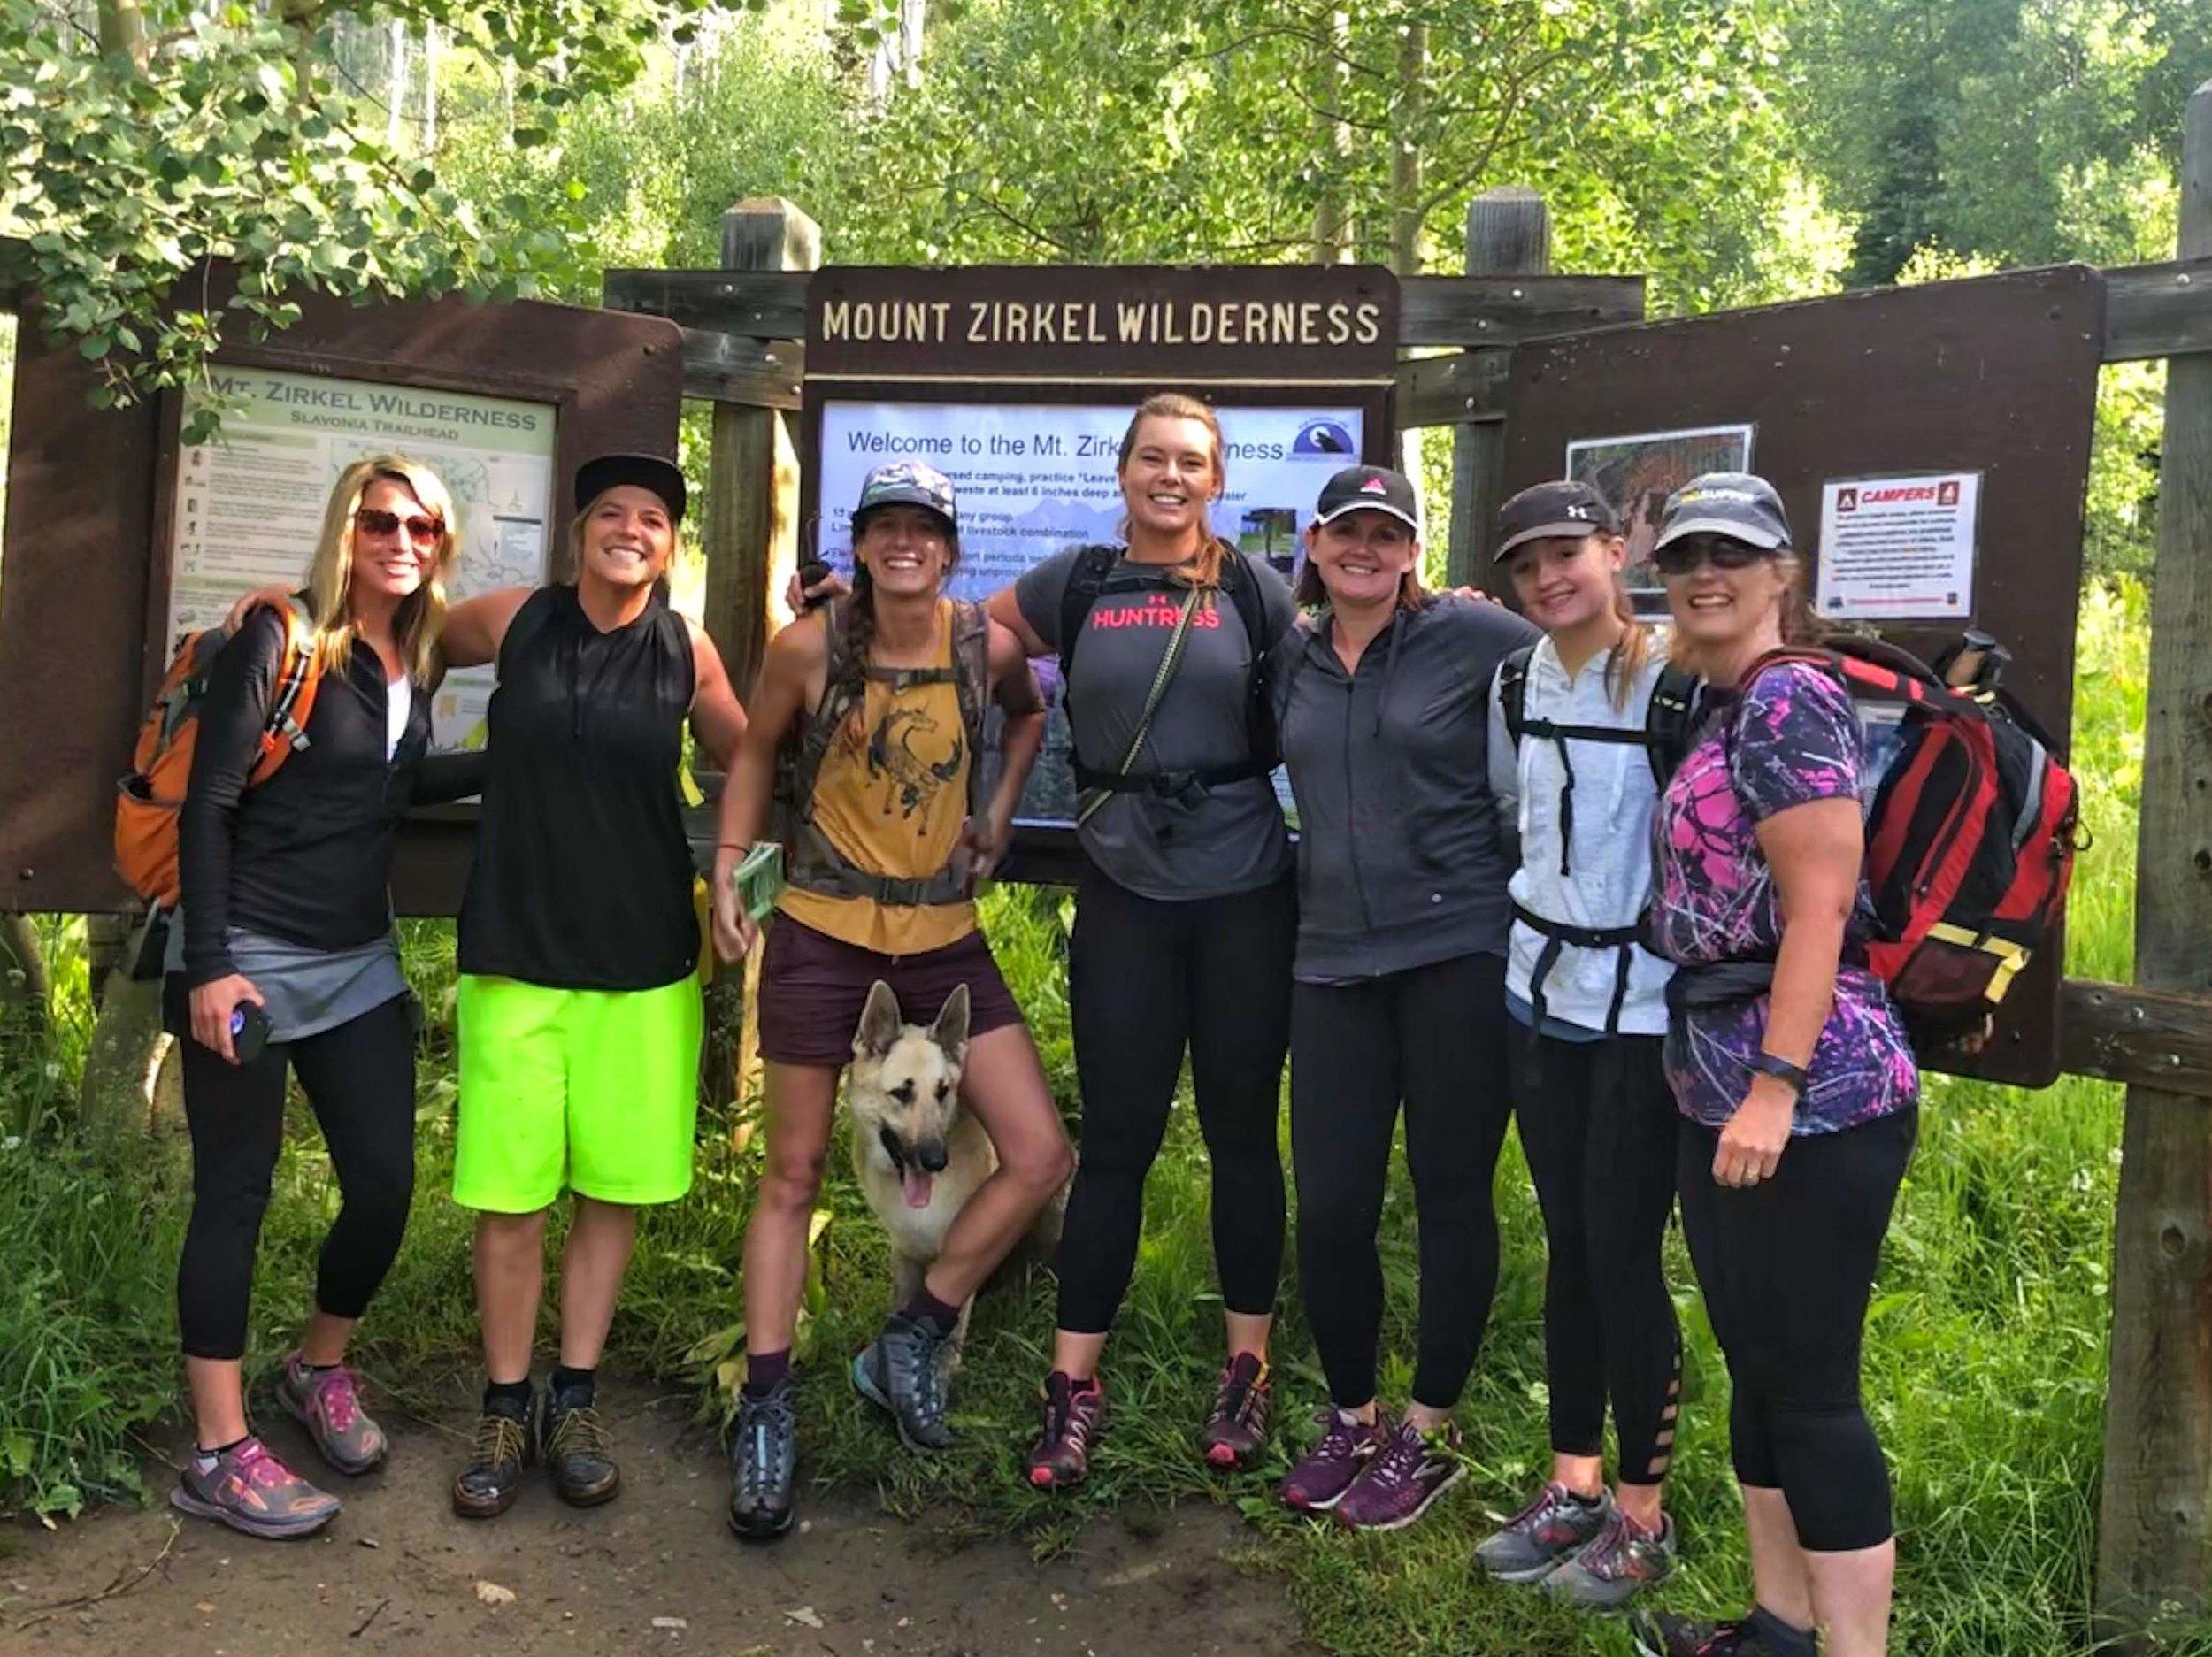 Our Zirkel Circle Team: Nicole, Caitlin, Elena, Jaime, Rebecca, Alayna, and Misty